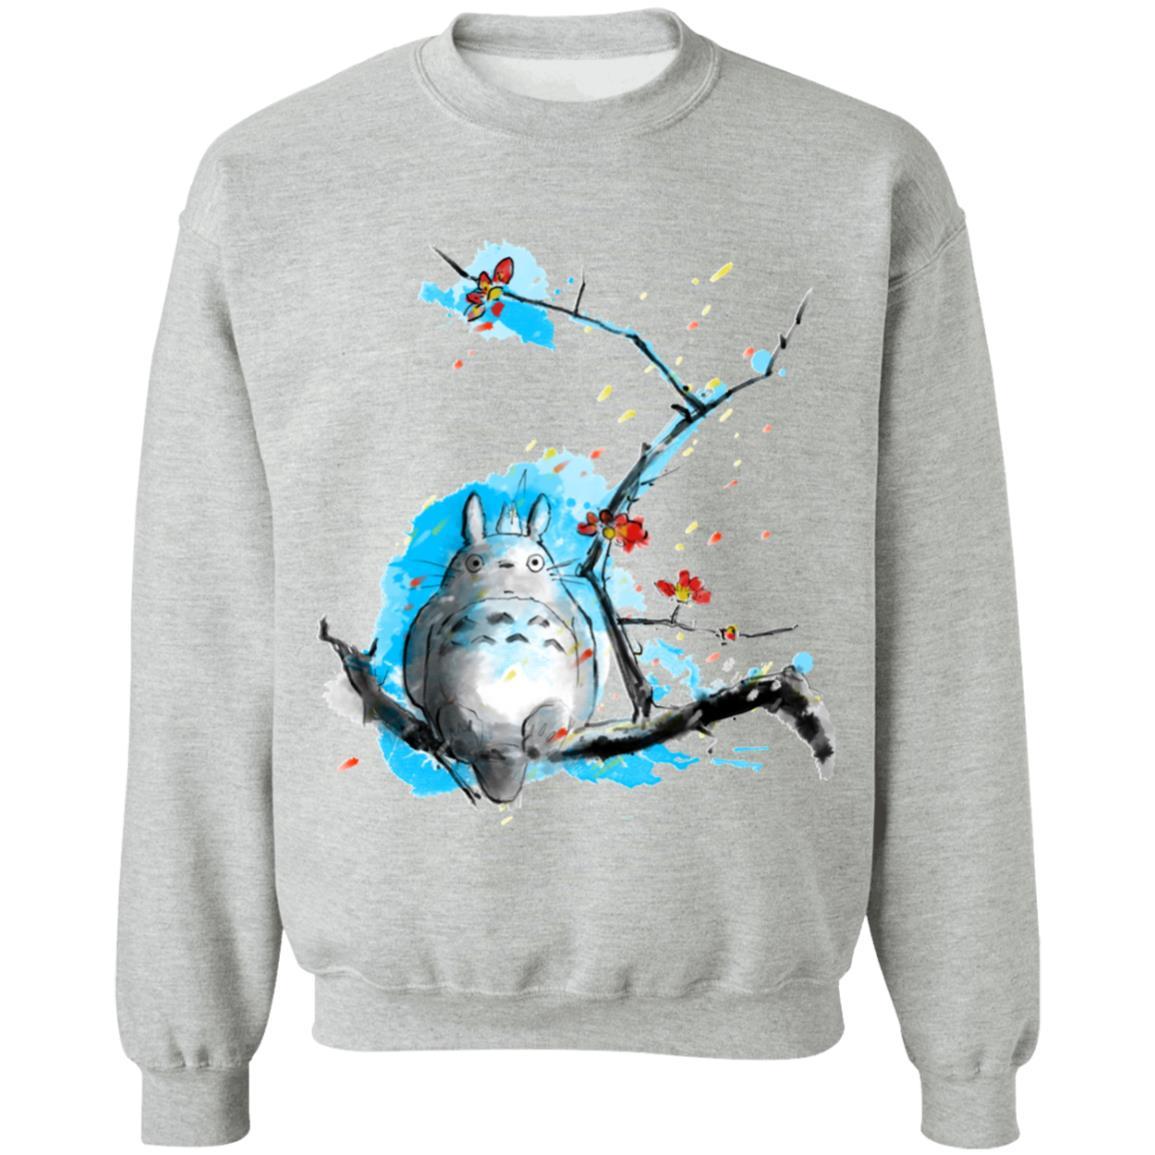 Totoro by Sakura and Blue Sky Sweatshirt